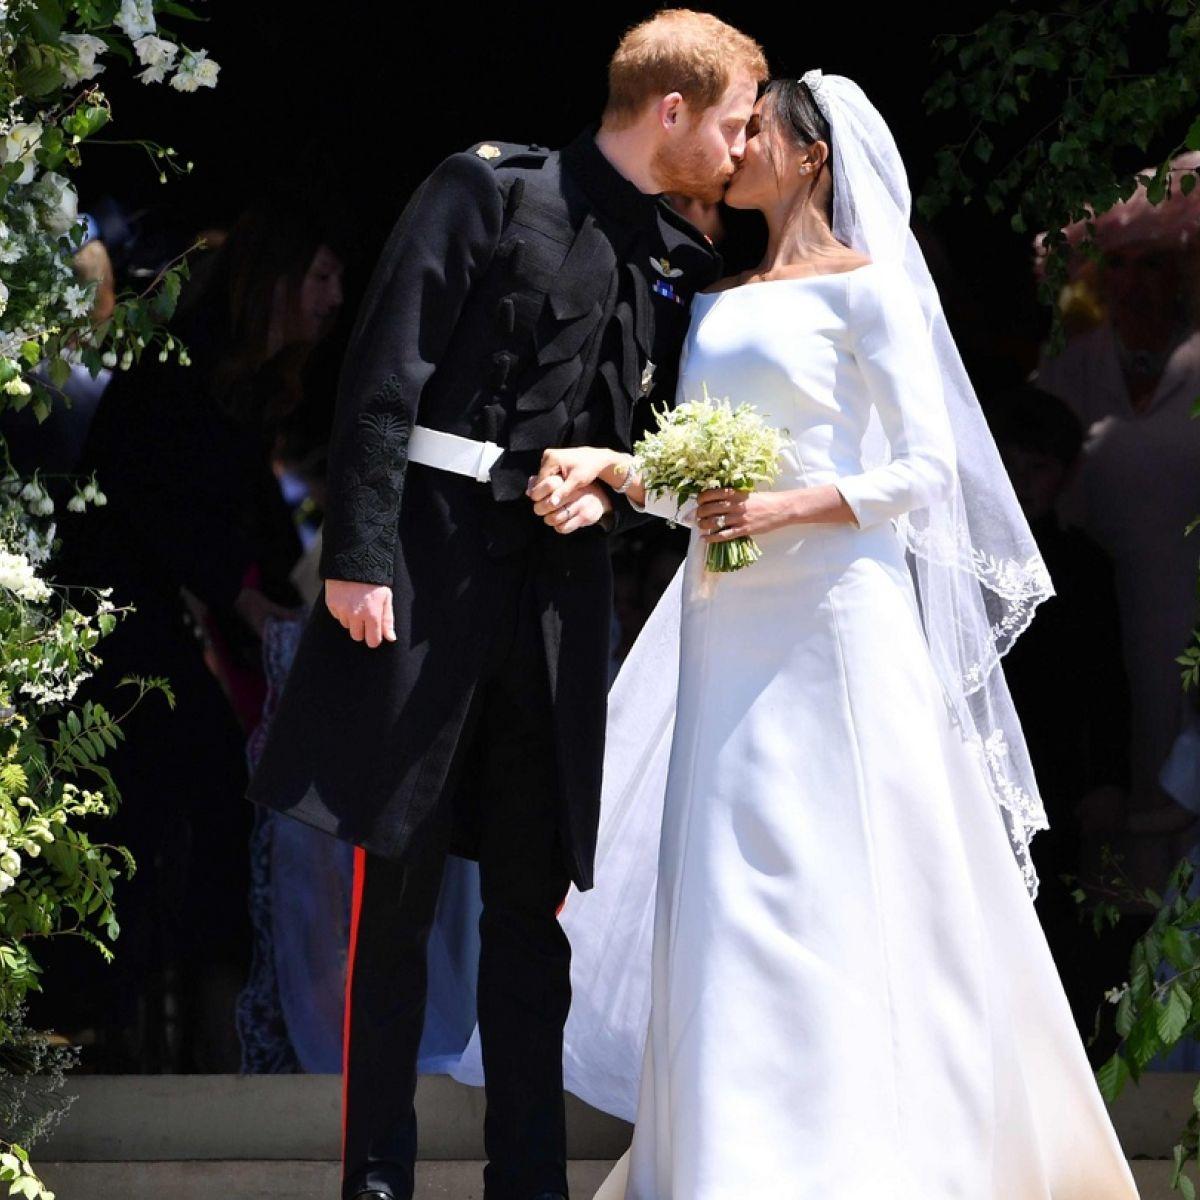 8ec40c4716110 Meghan Markle exudes sleek style in choice of wedding dress